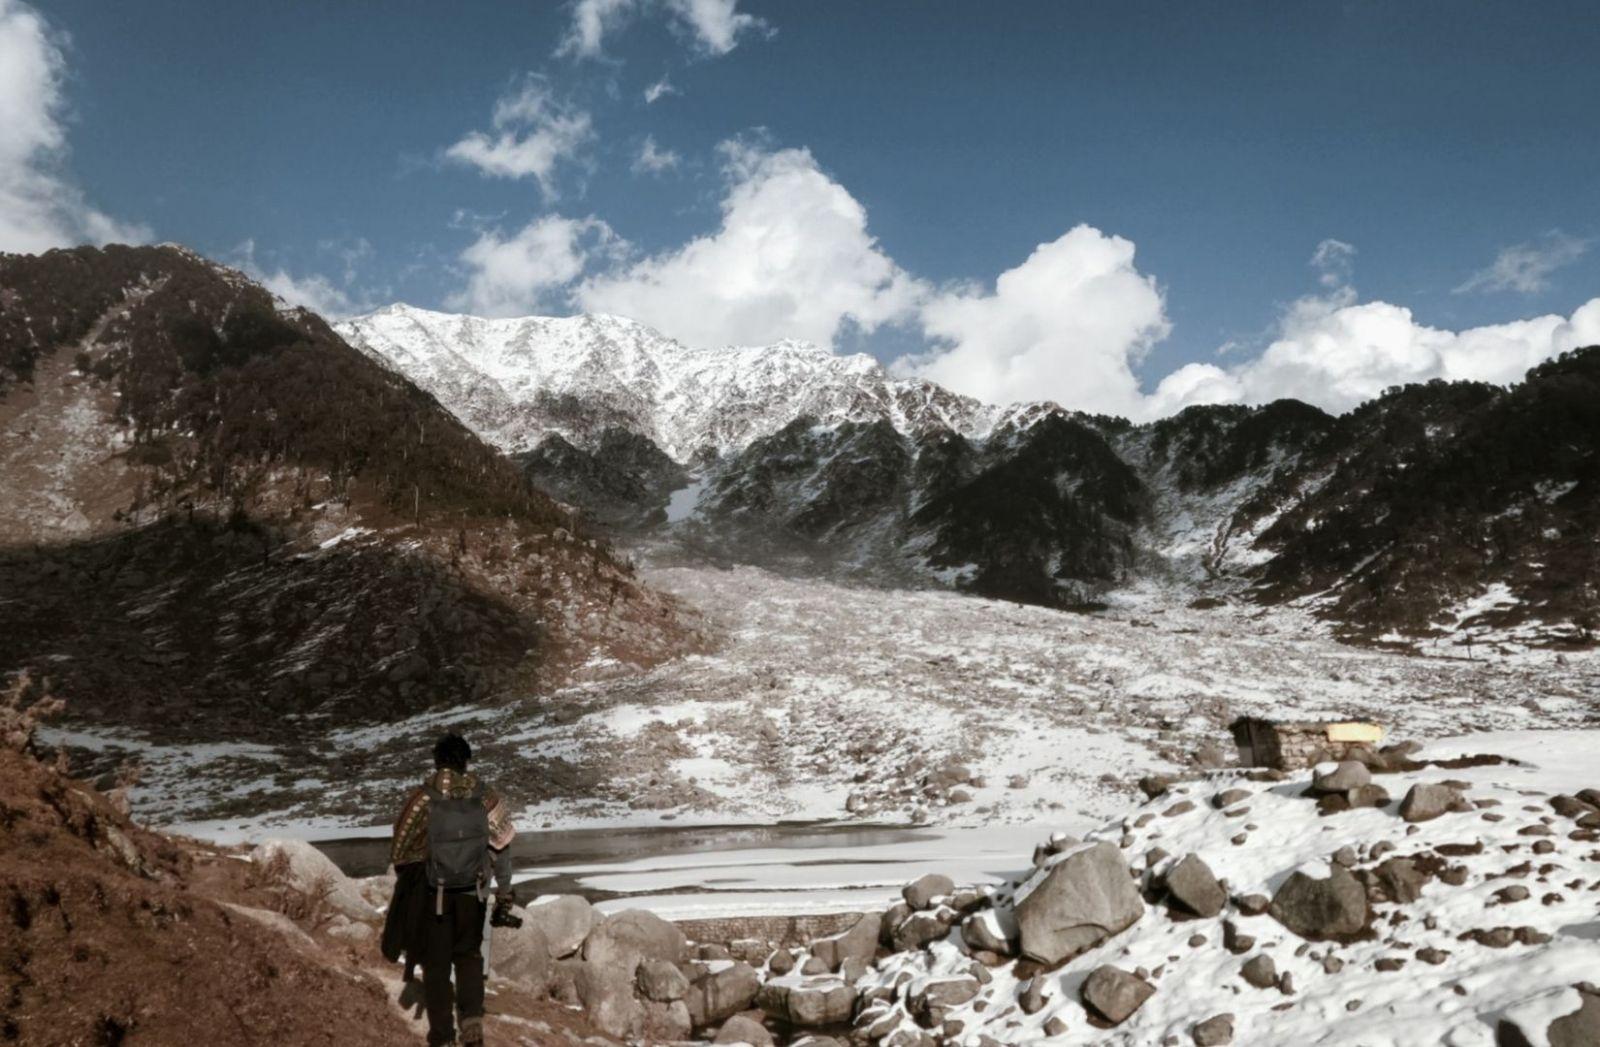 Rani Sui Llake, Manali, Himachal Pradesh, India. (Foto: Gaurav Khemka, Unsplash.com)